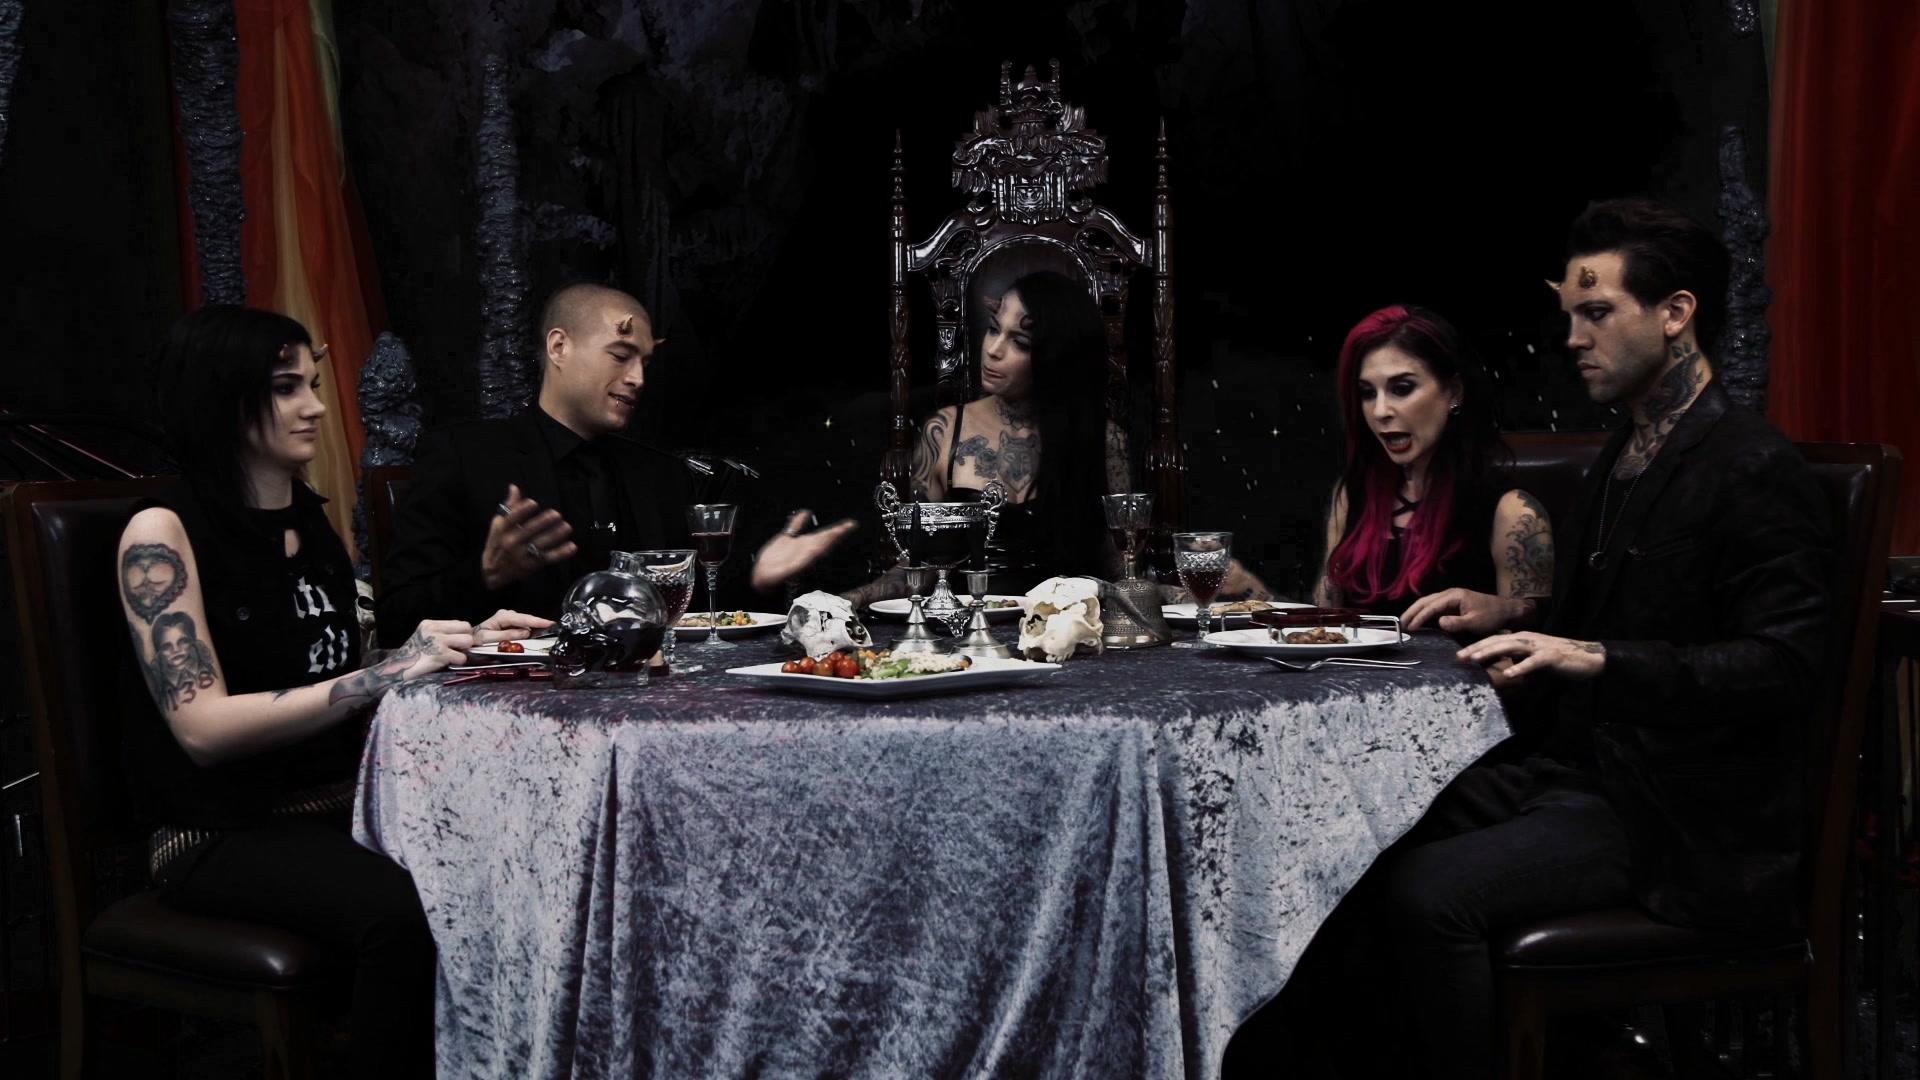 Scene with Joanna Angel, Xander Corvus and Ophelia Rain - image 17 out of 20